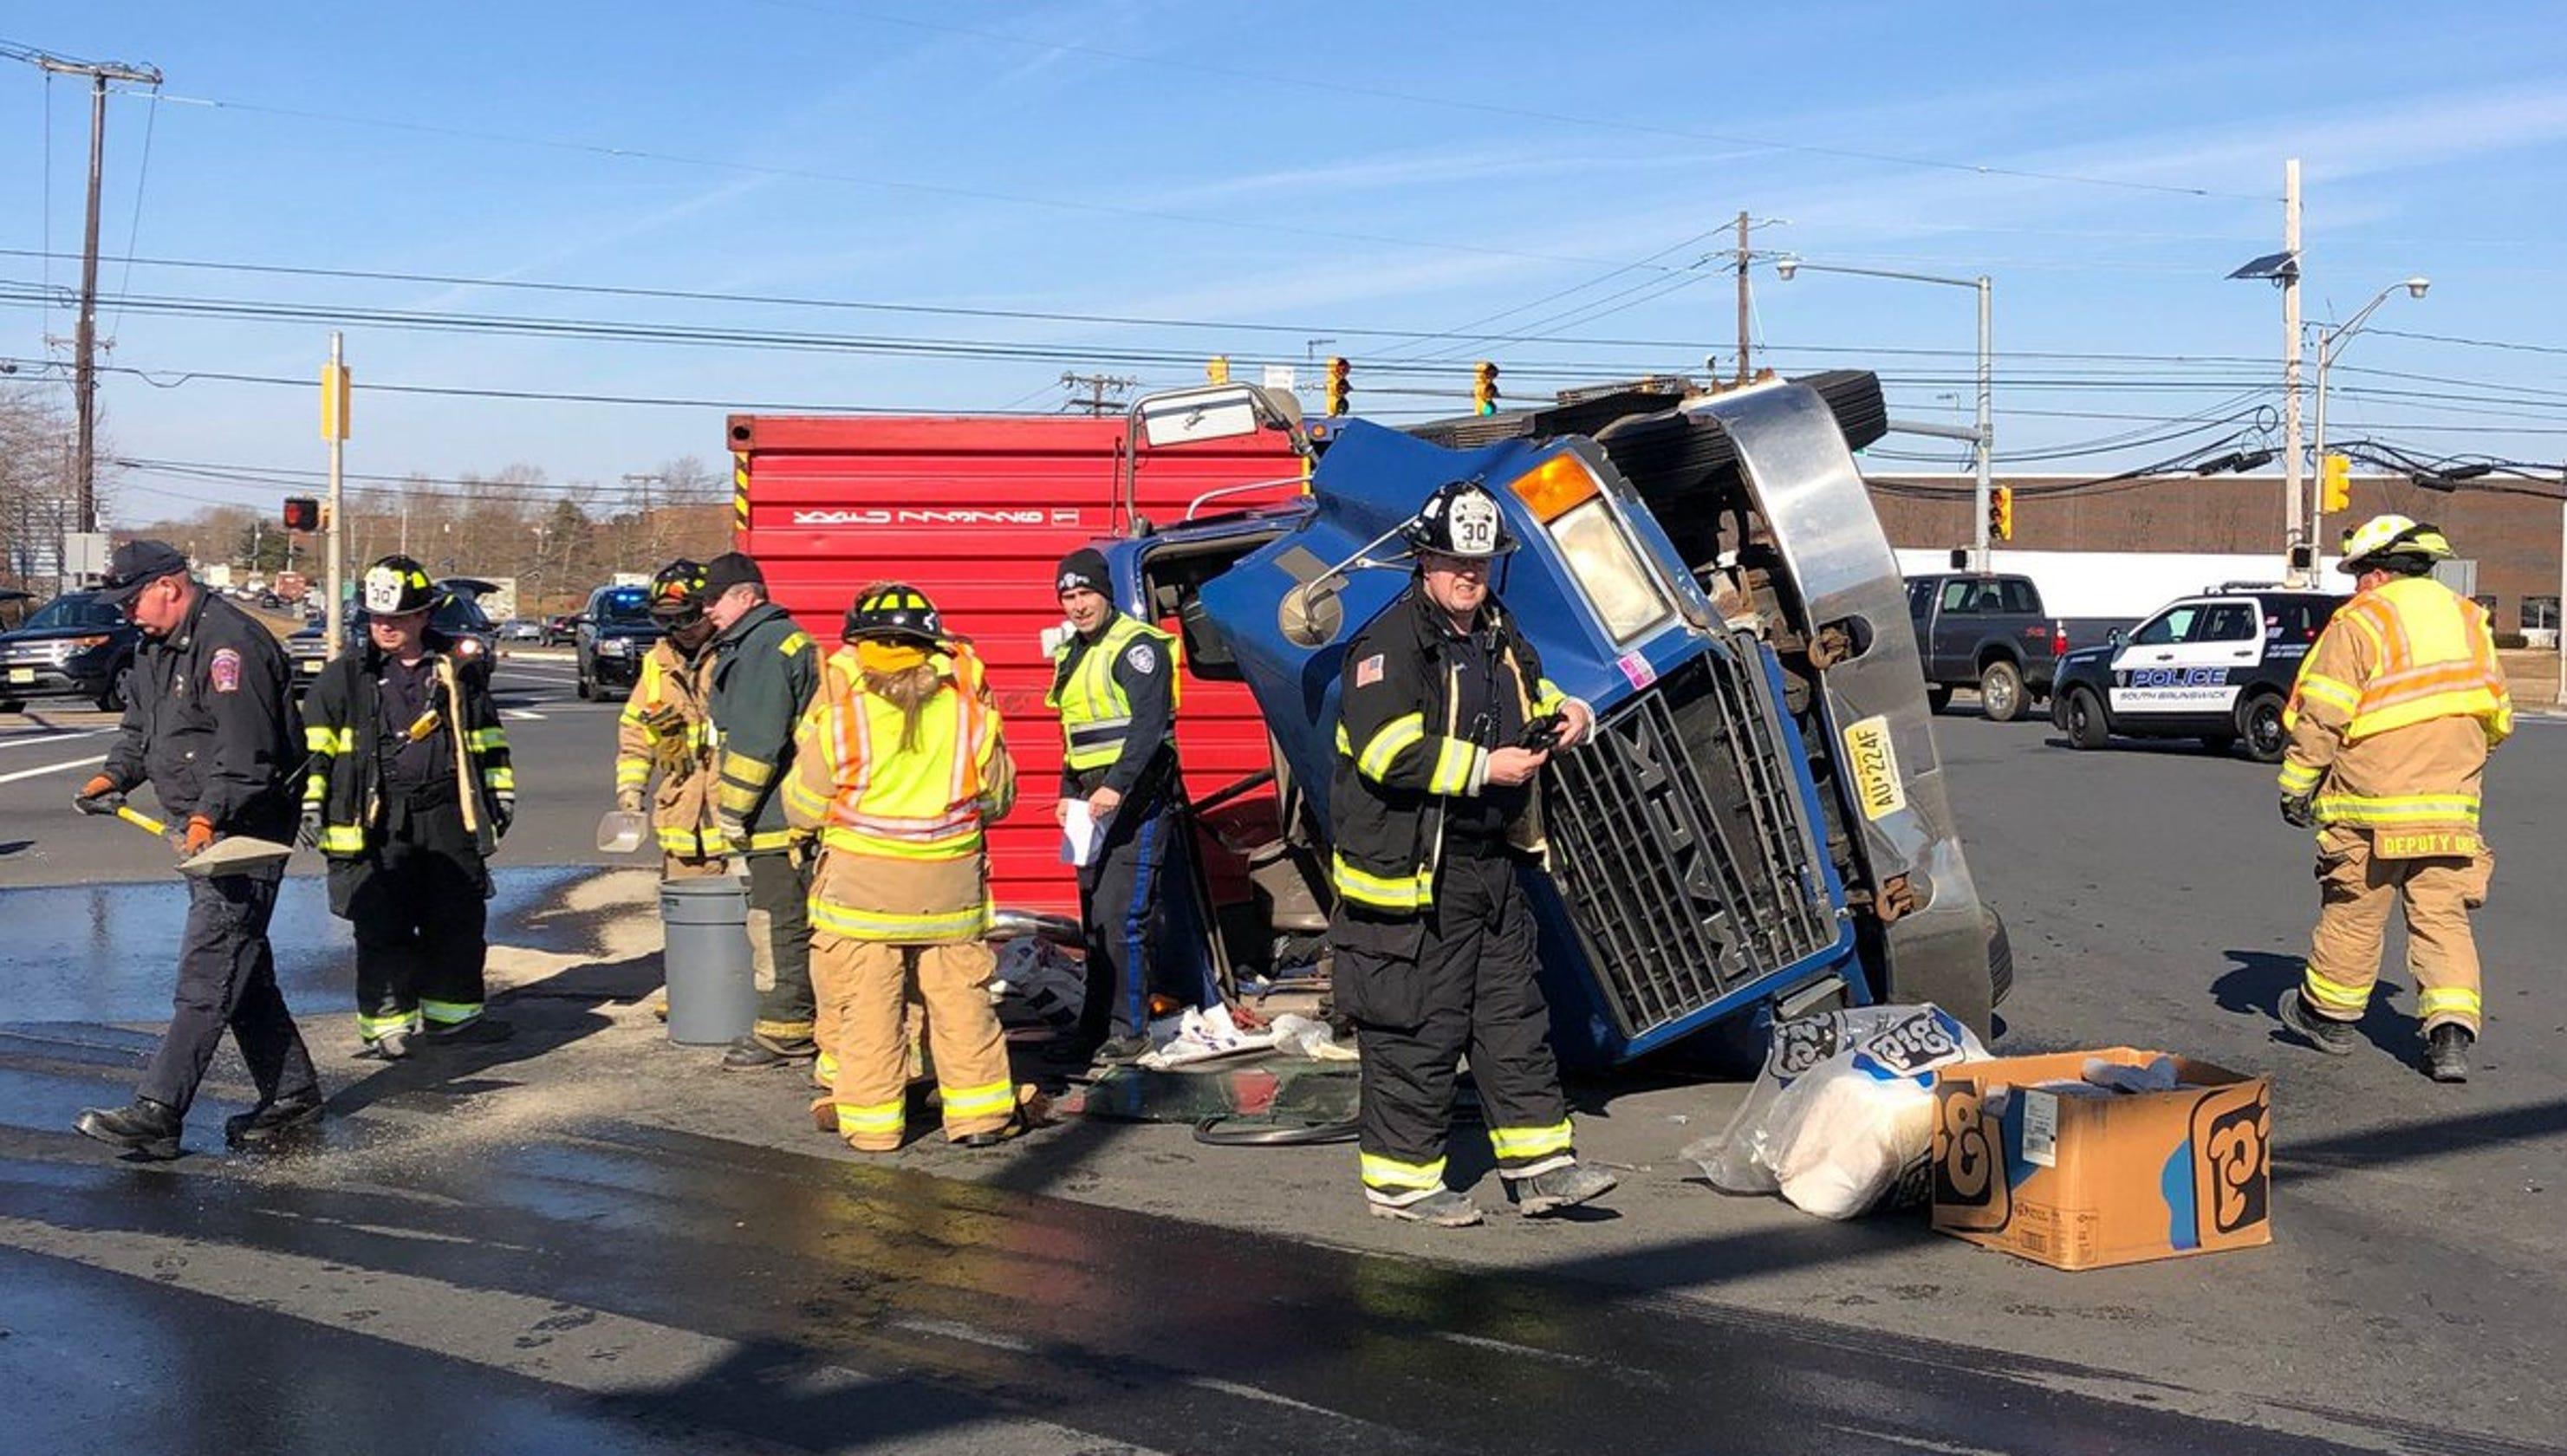 NJ traffic: Tractor-trailer overturns near NJ Turnpike exit